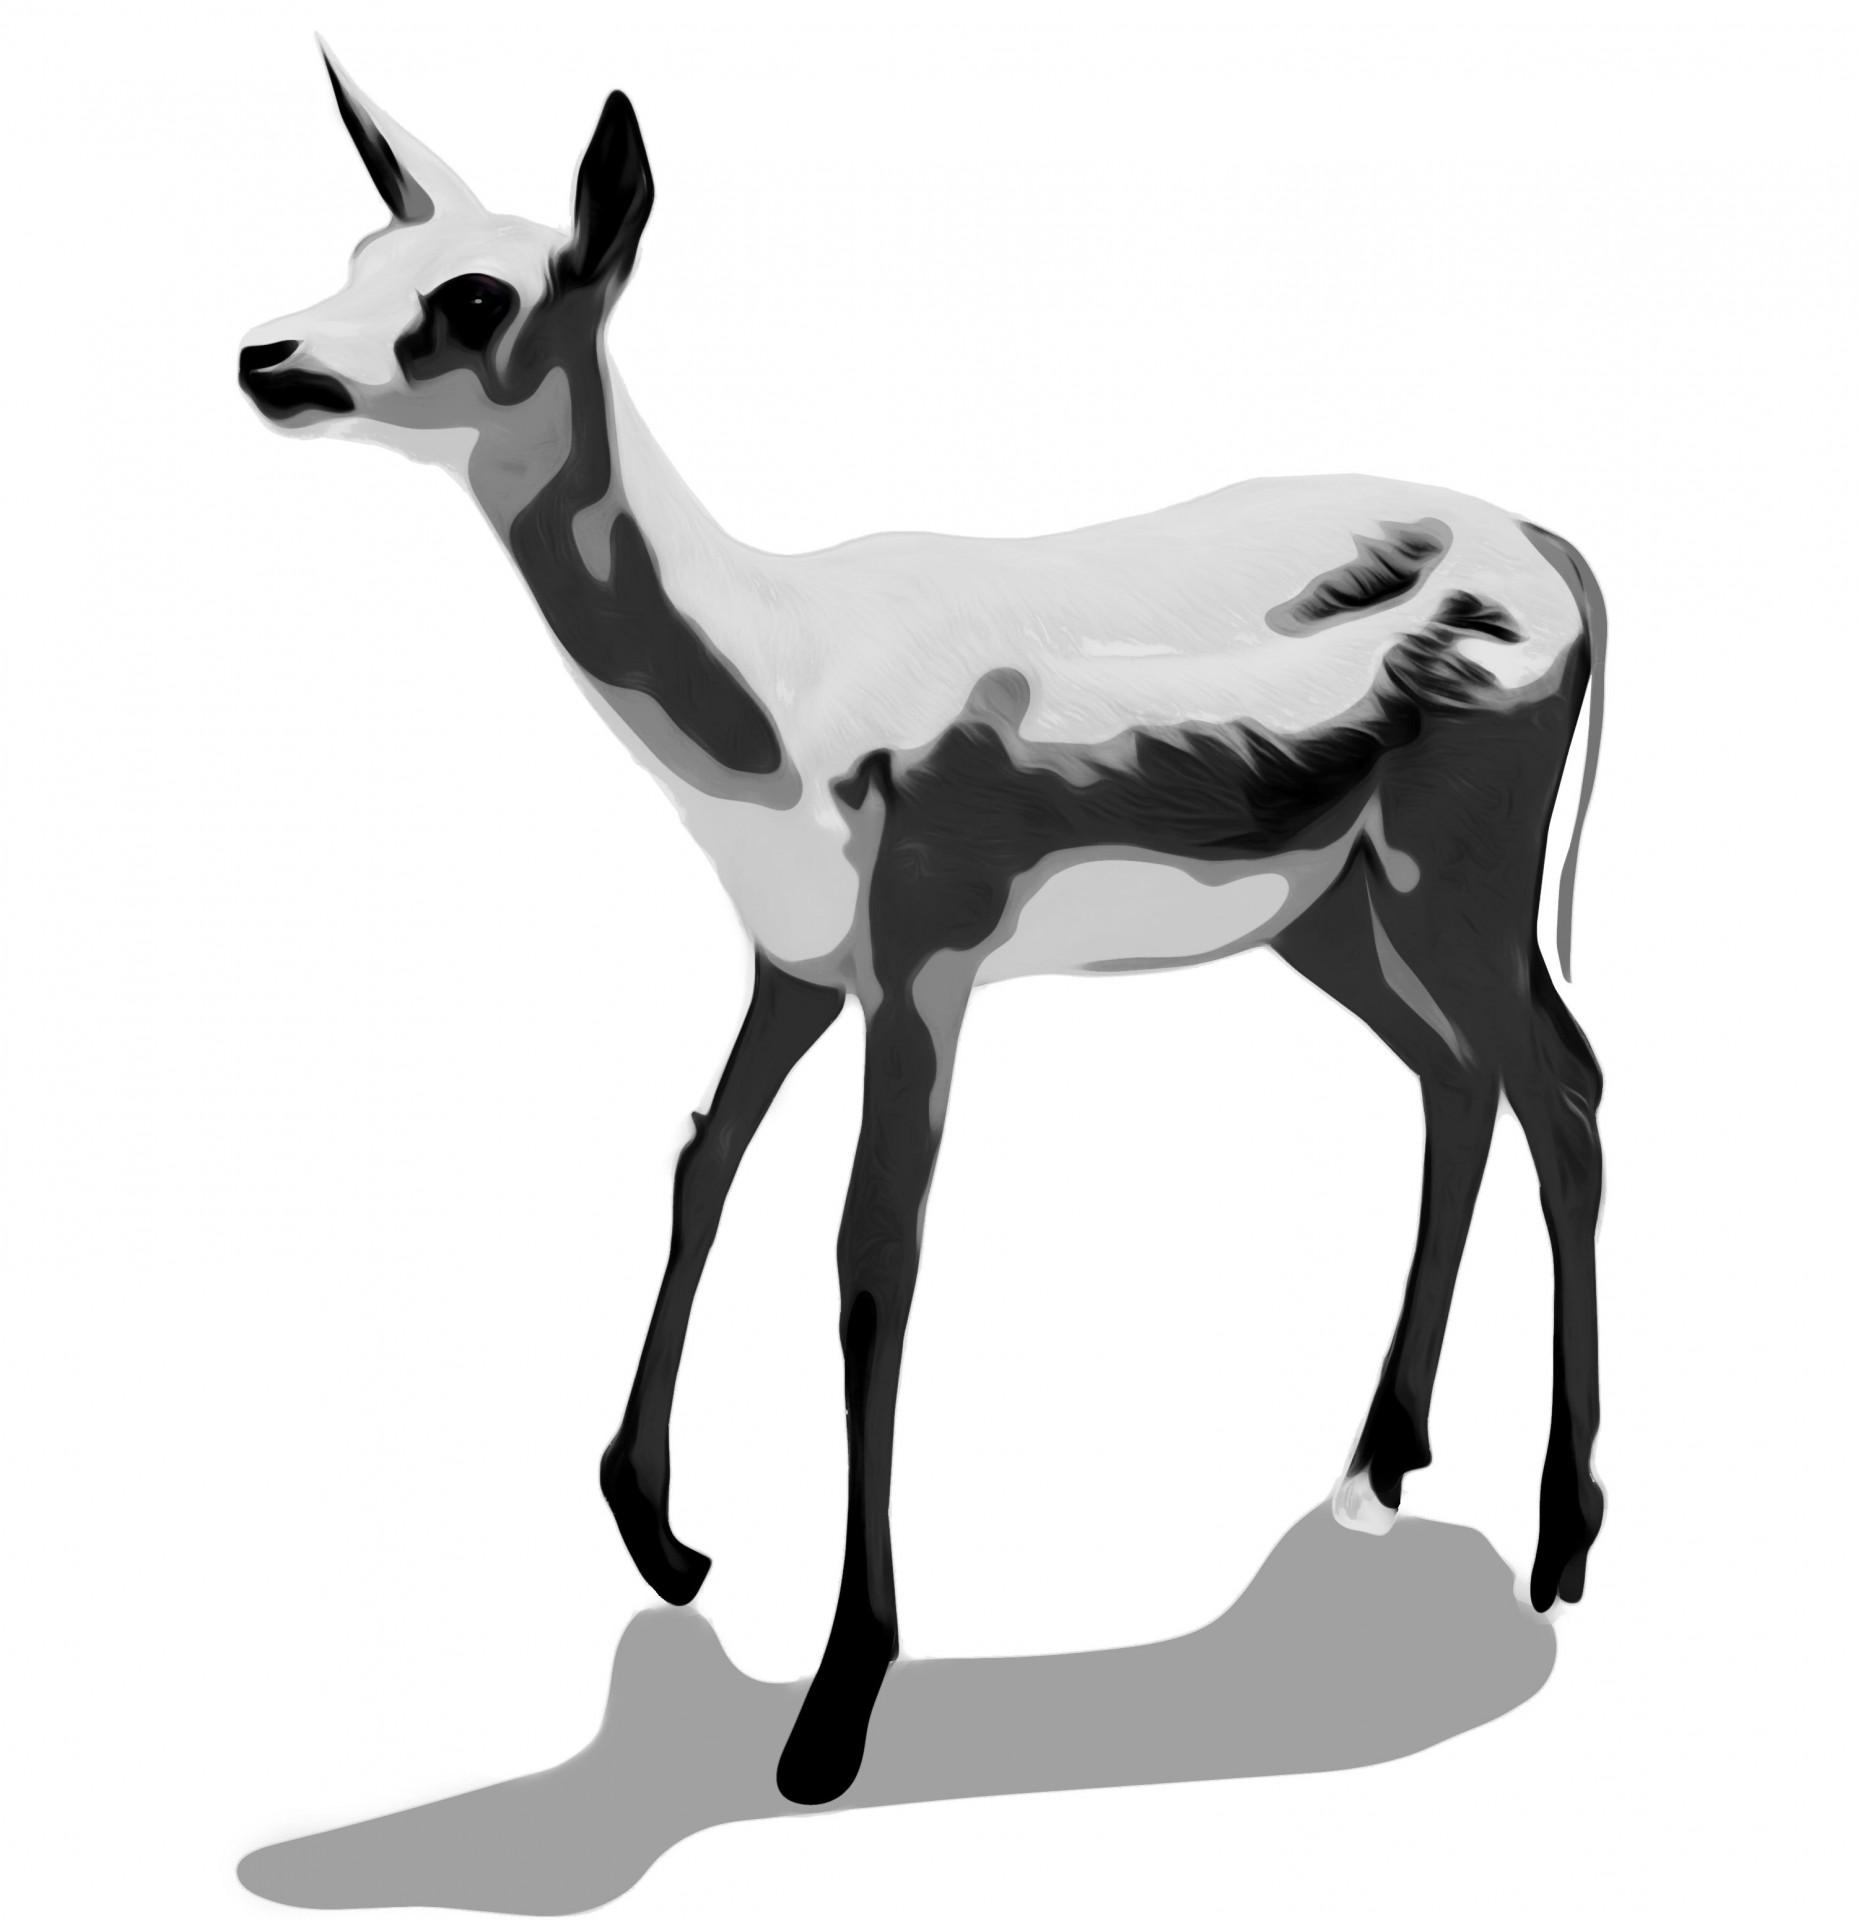 1858x1920 Clip Art Deer Free Stock Photo